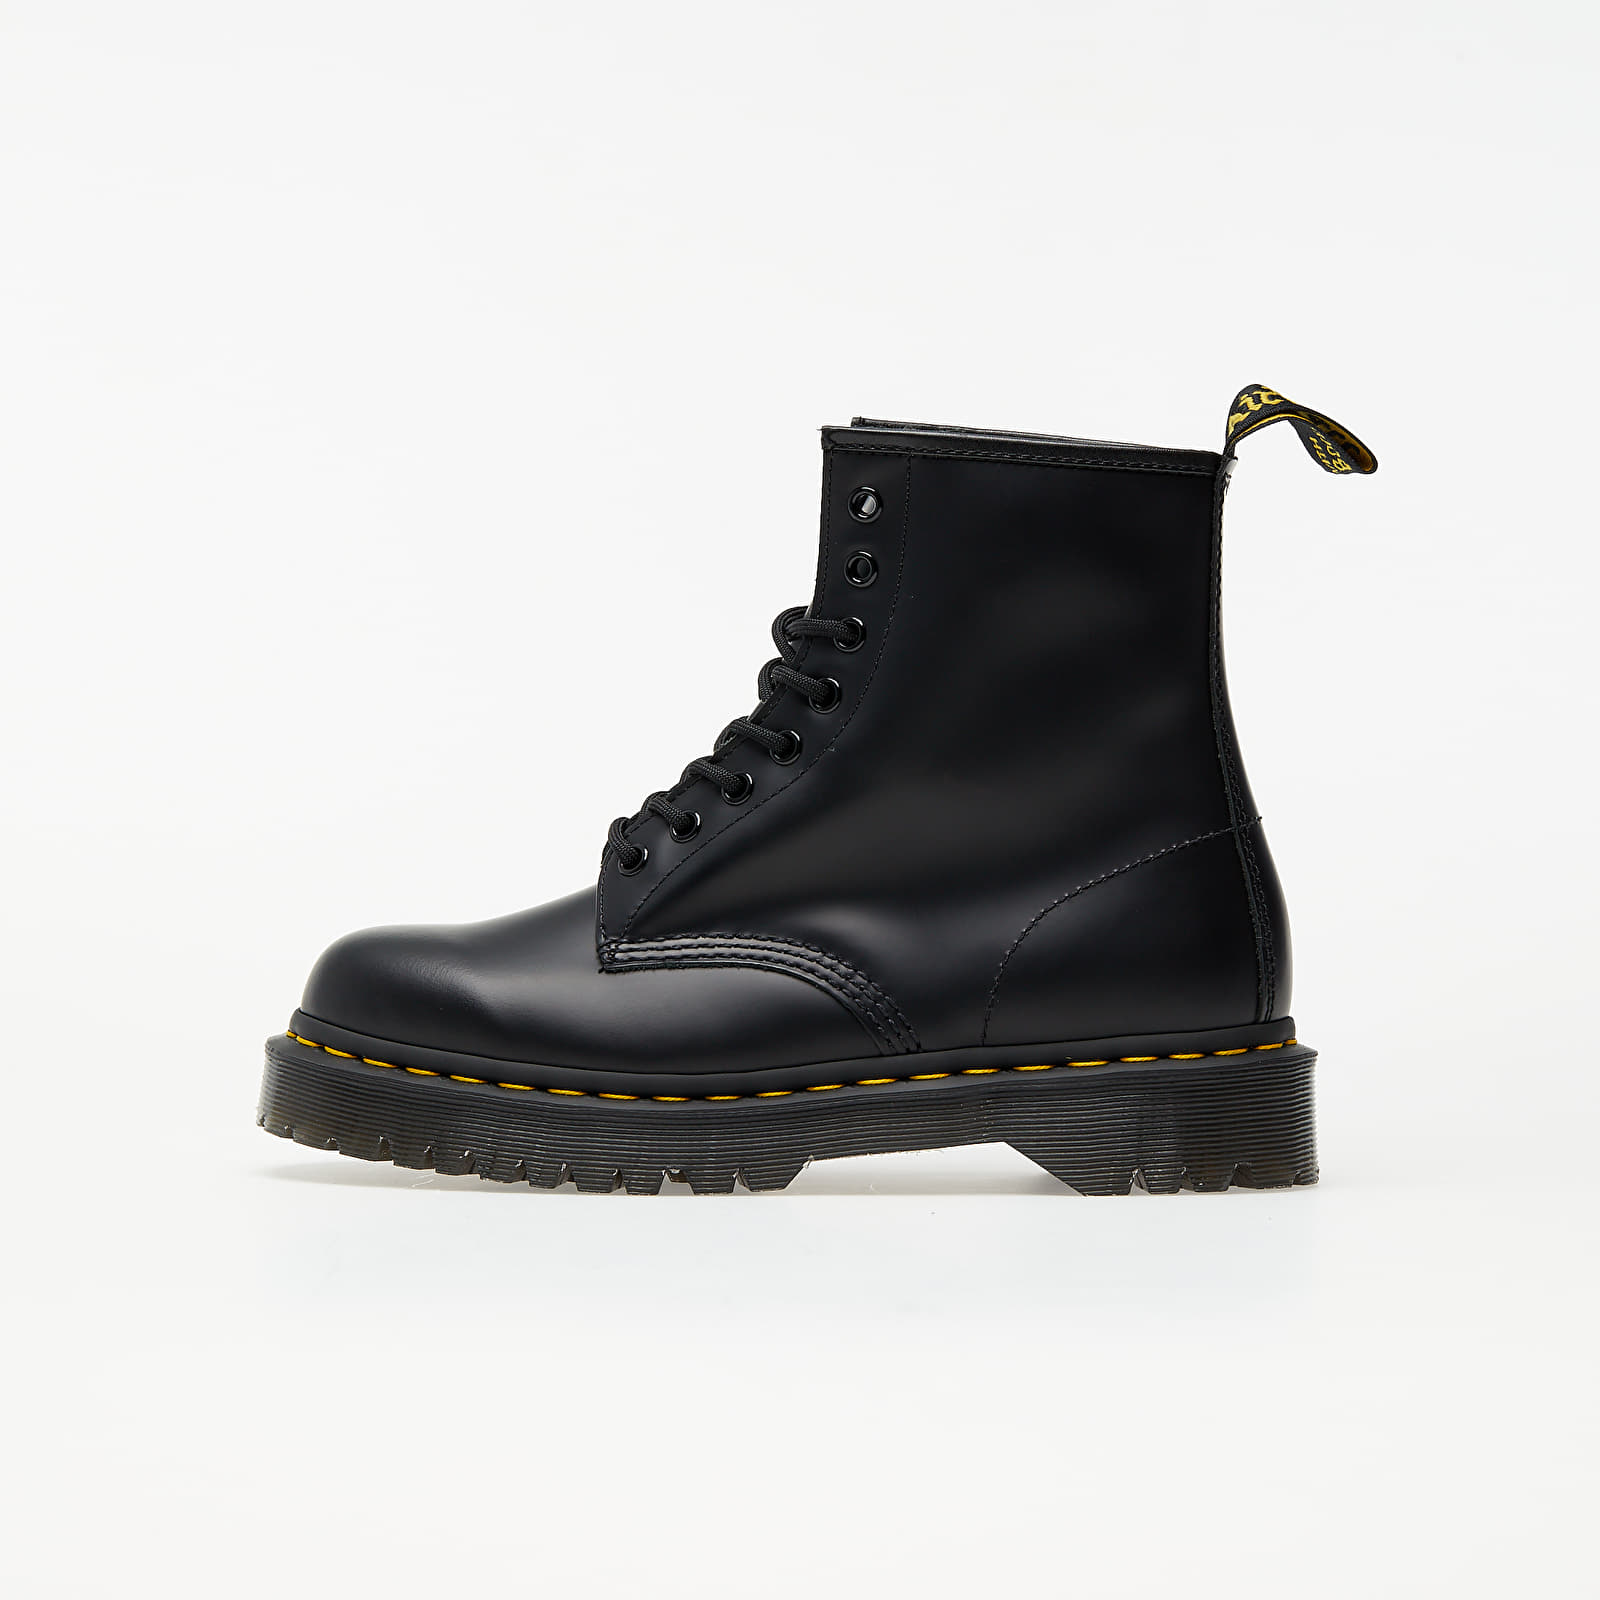 Dr. Martens 1460 Bex 8 Eye Boot Black DM25345001